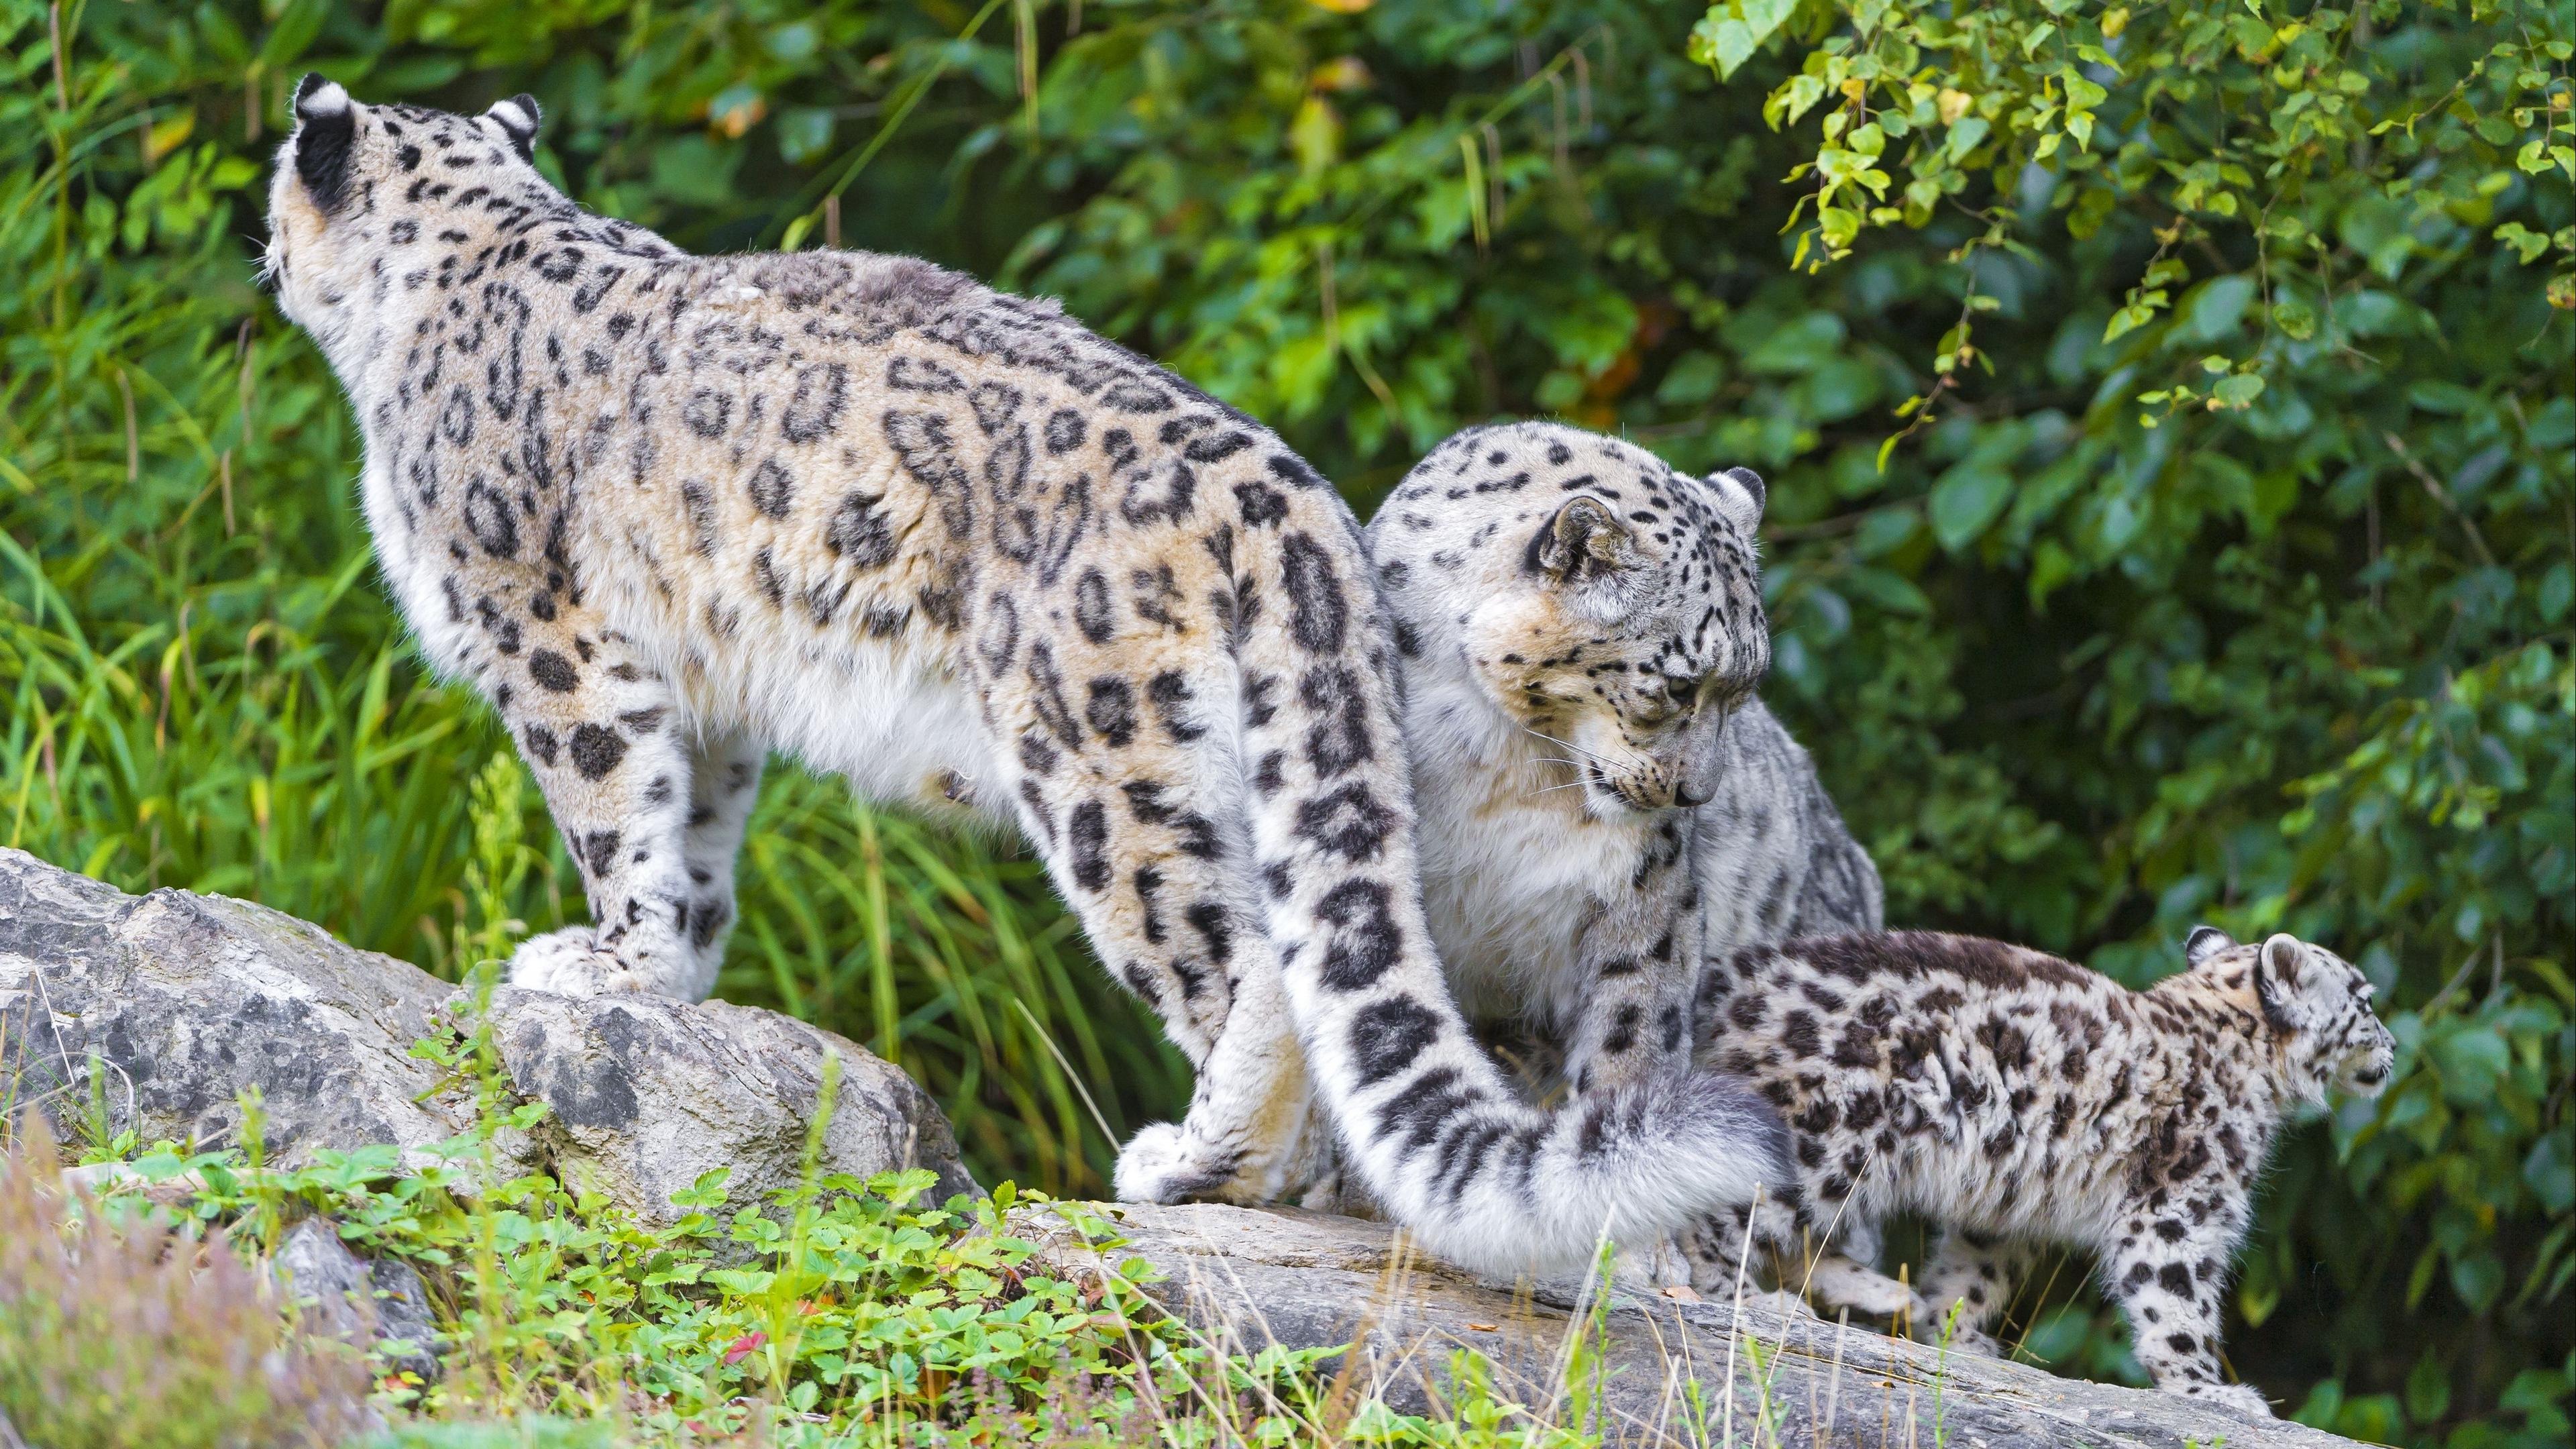 snow leopard little family 4k 1542242550 - snow leopard, little, family 4k - snow leopard, Little, Family